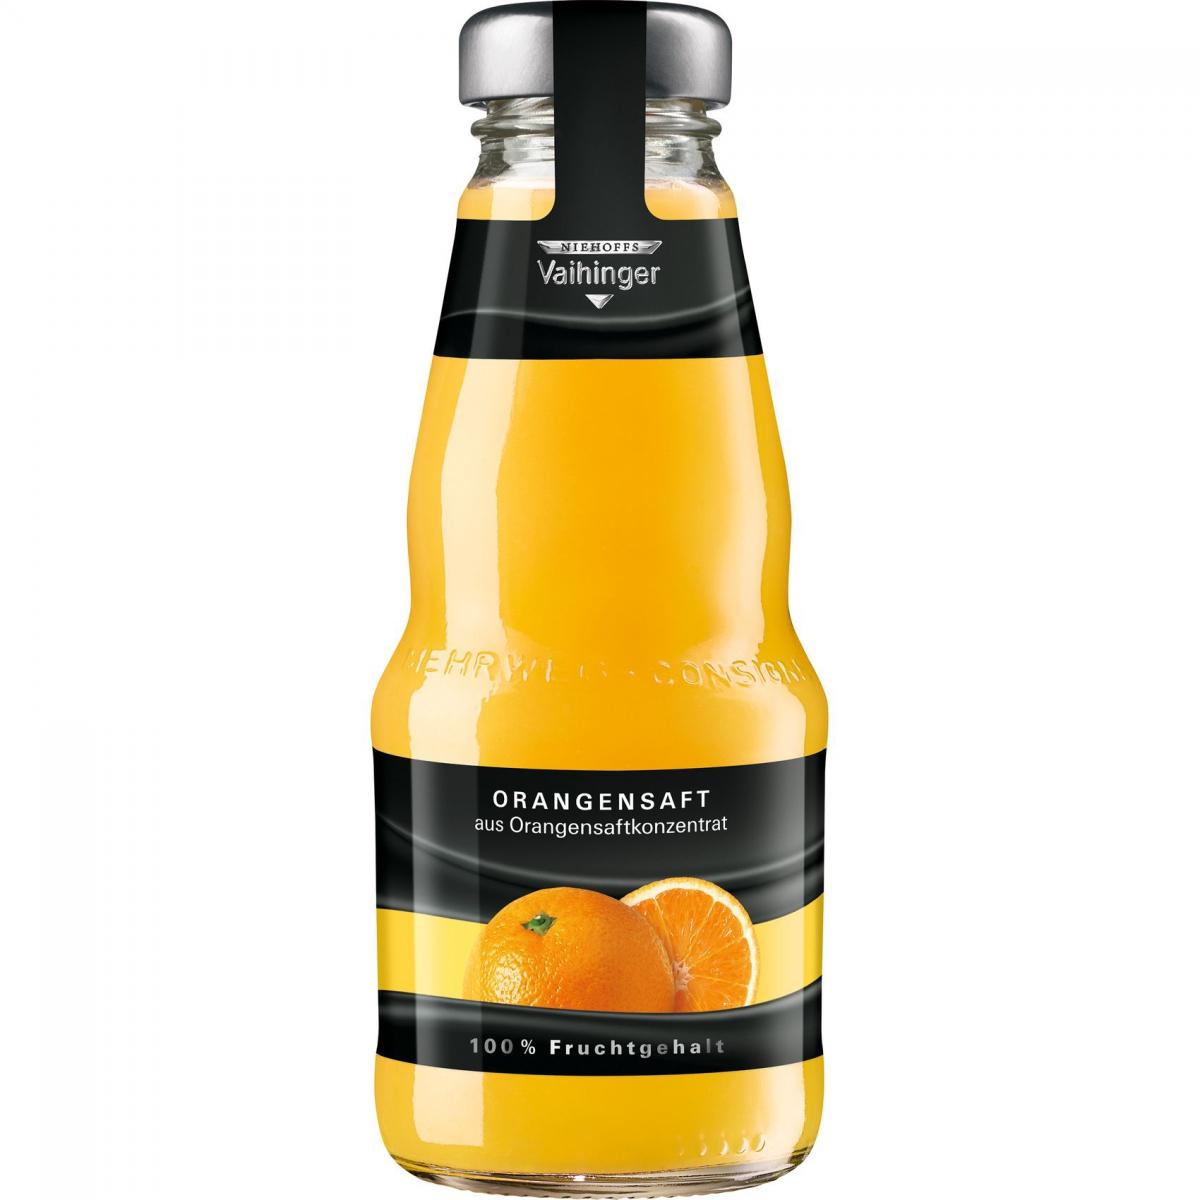 Vaihinger ORANGENSAFT 24x0,2L Gastro